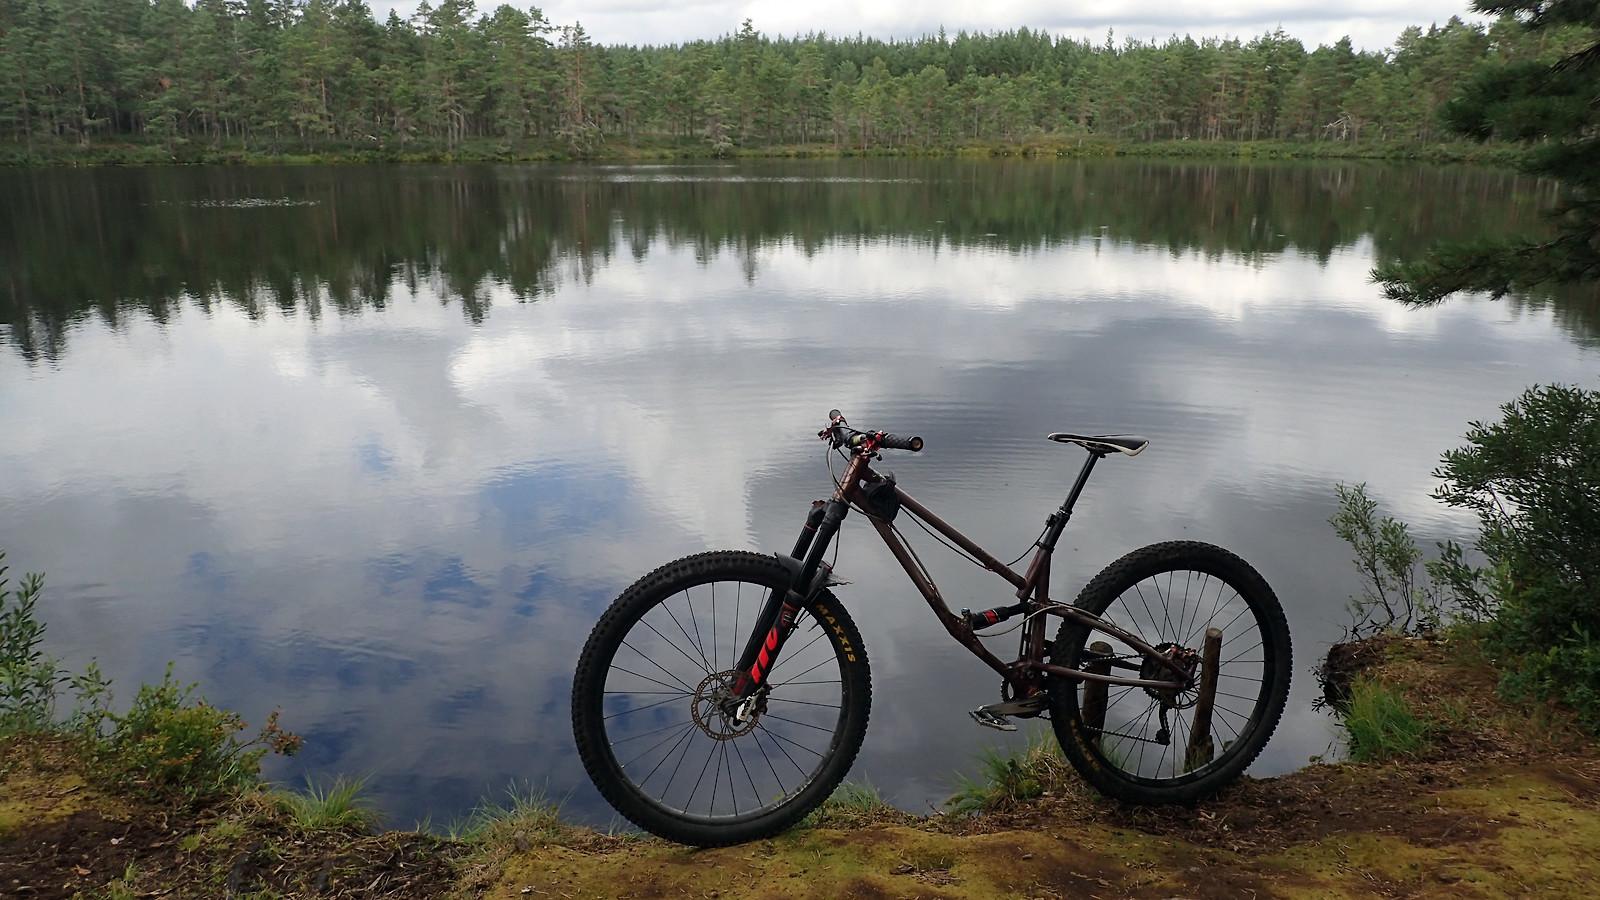 beast of the lake - EST - Mountain Biking Pictures - Vital MTB